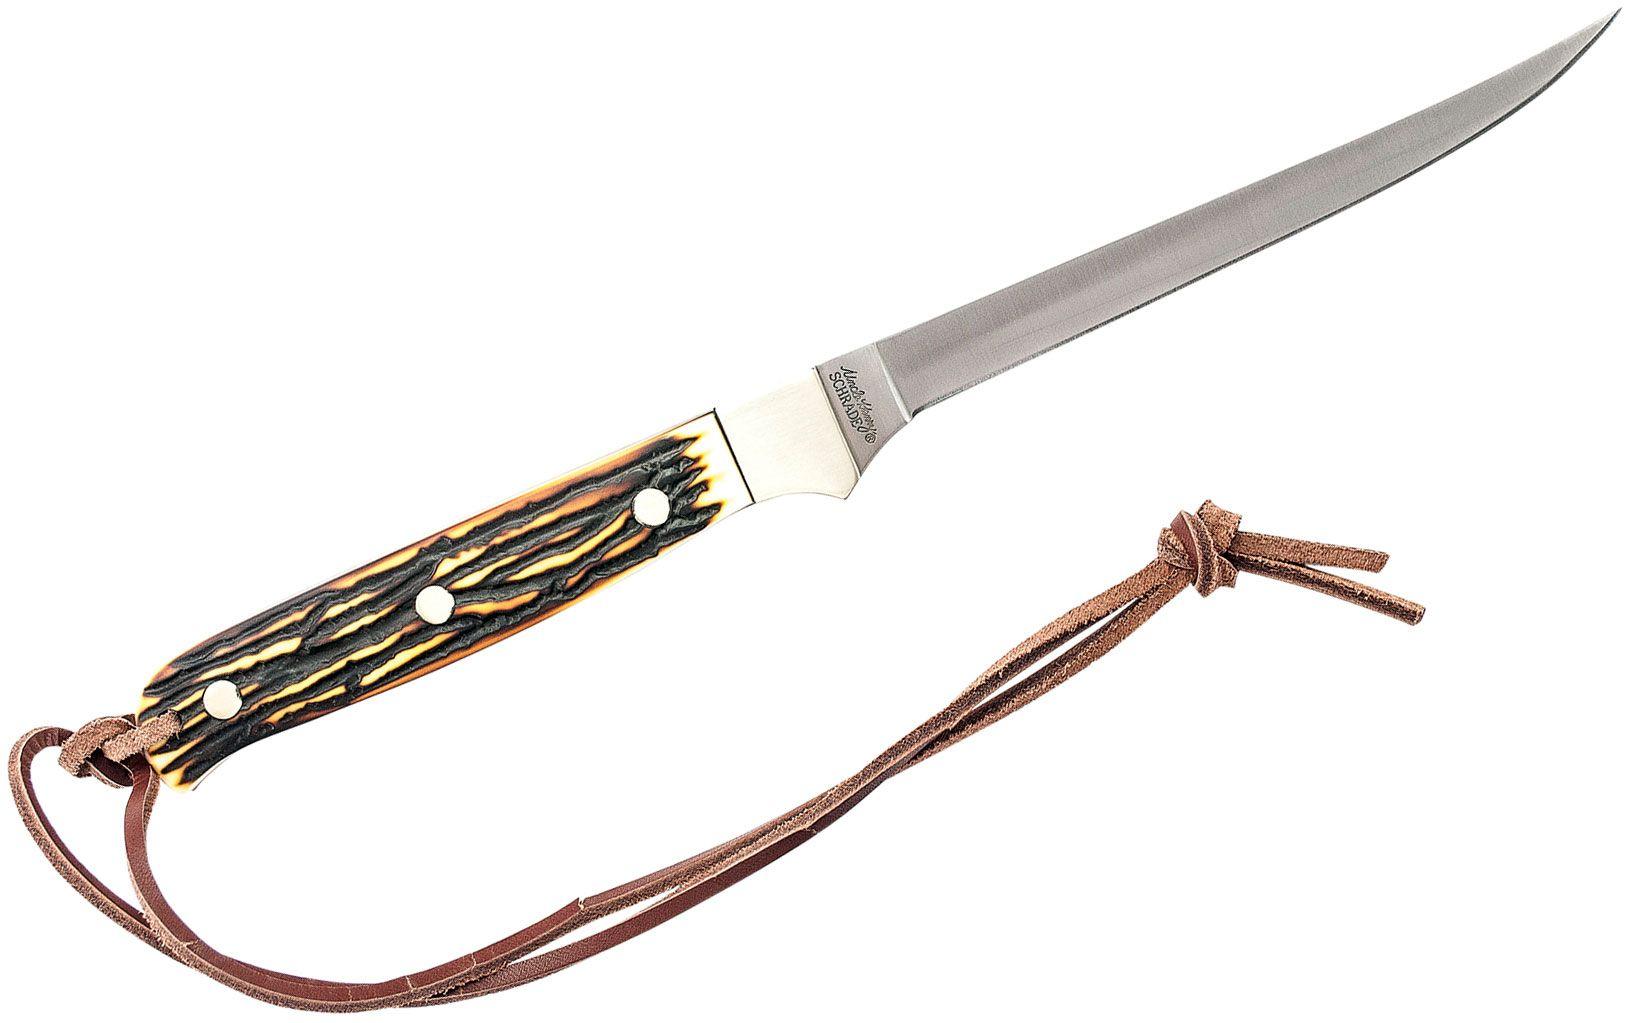 Schrade 168UH Uncle Henry Fillet Knife 5-1/4 inch Blade, Delrin Stag Handles